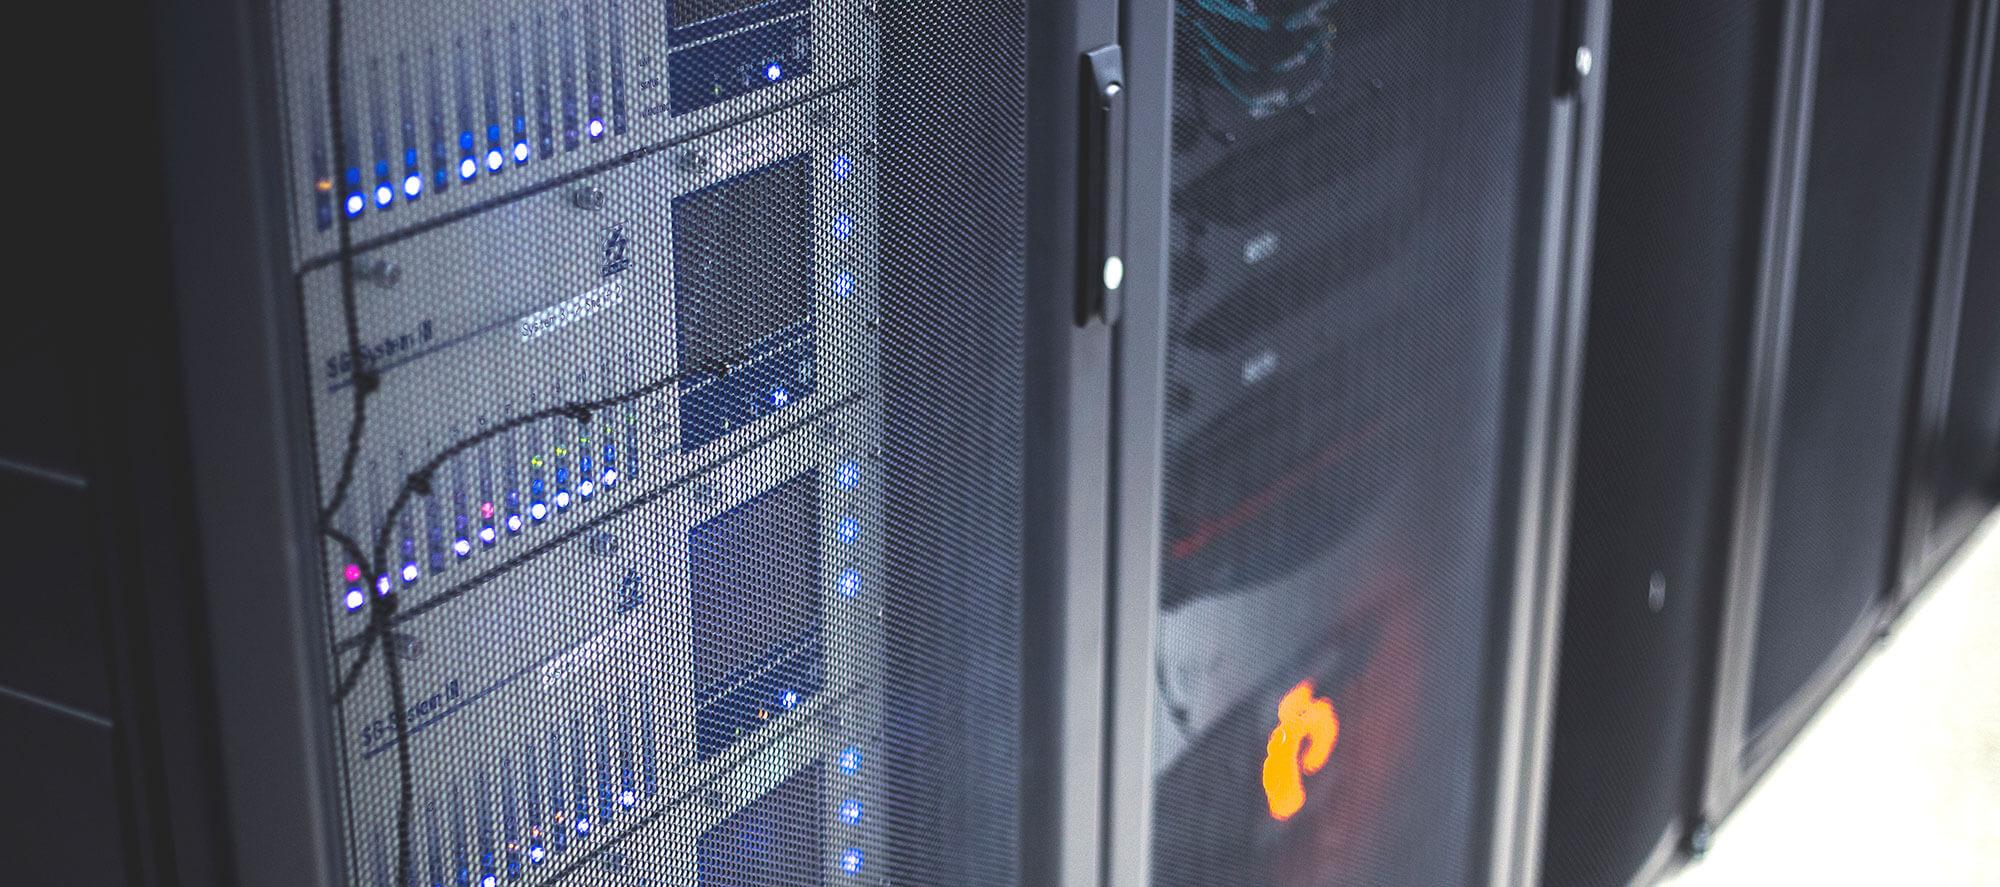 monitoring-technology, server, technology